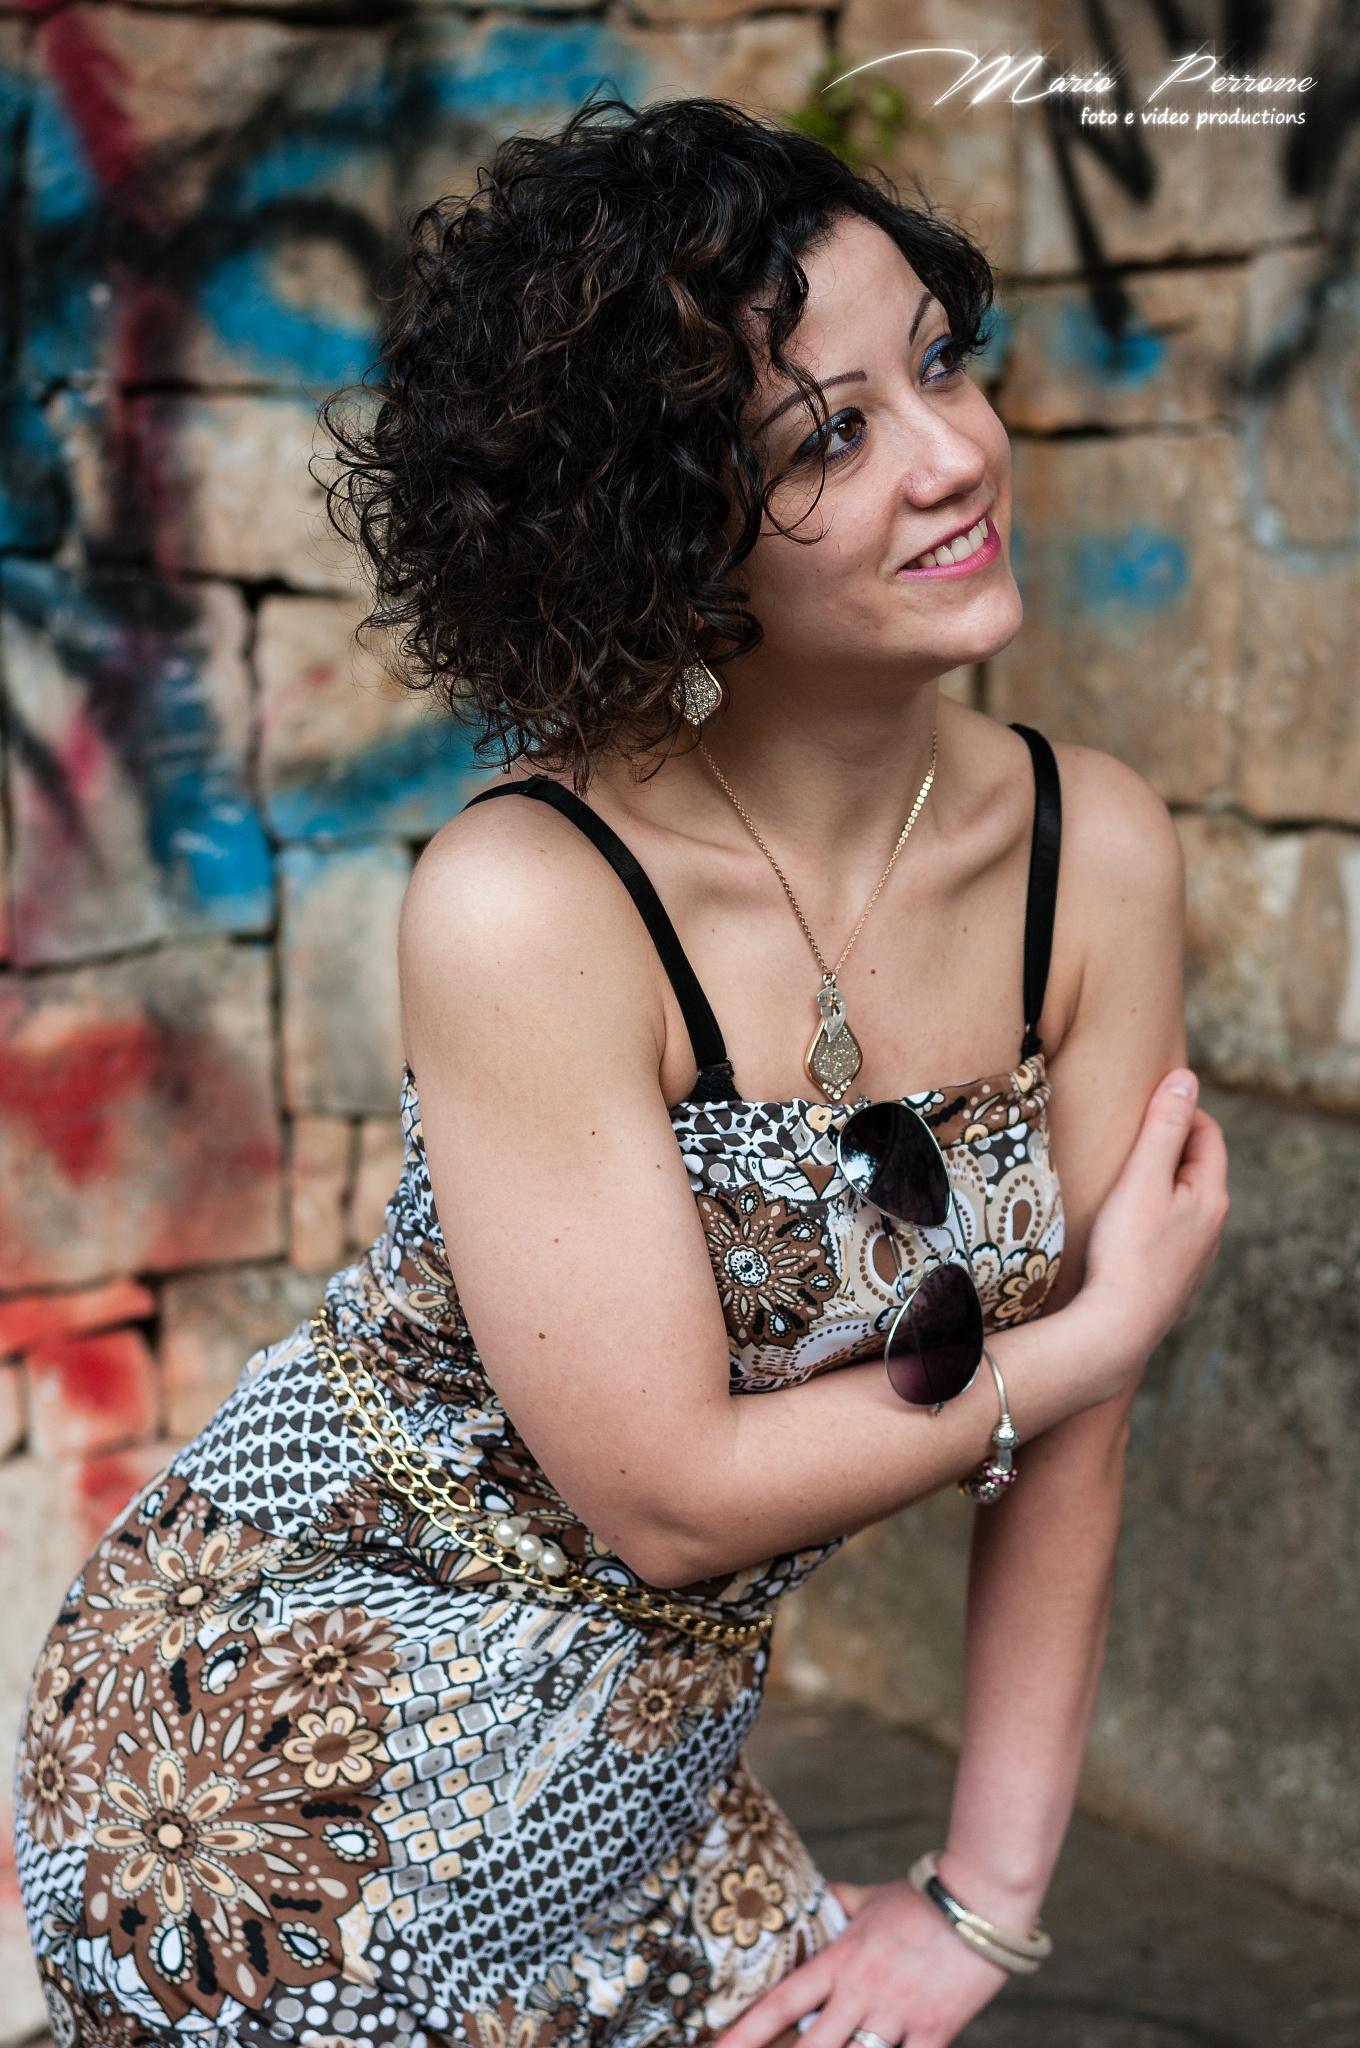 Anna by Mario Perrone